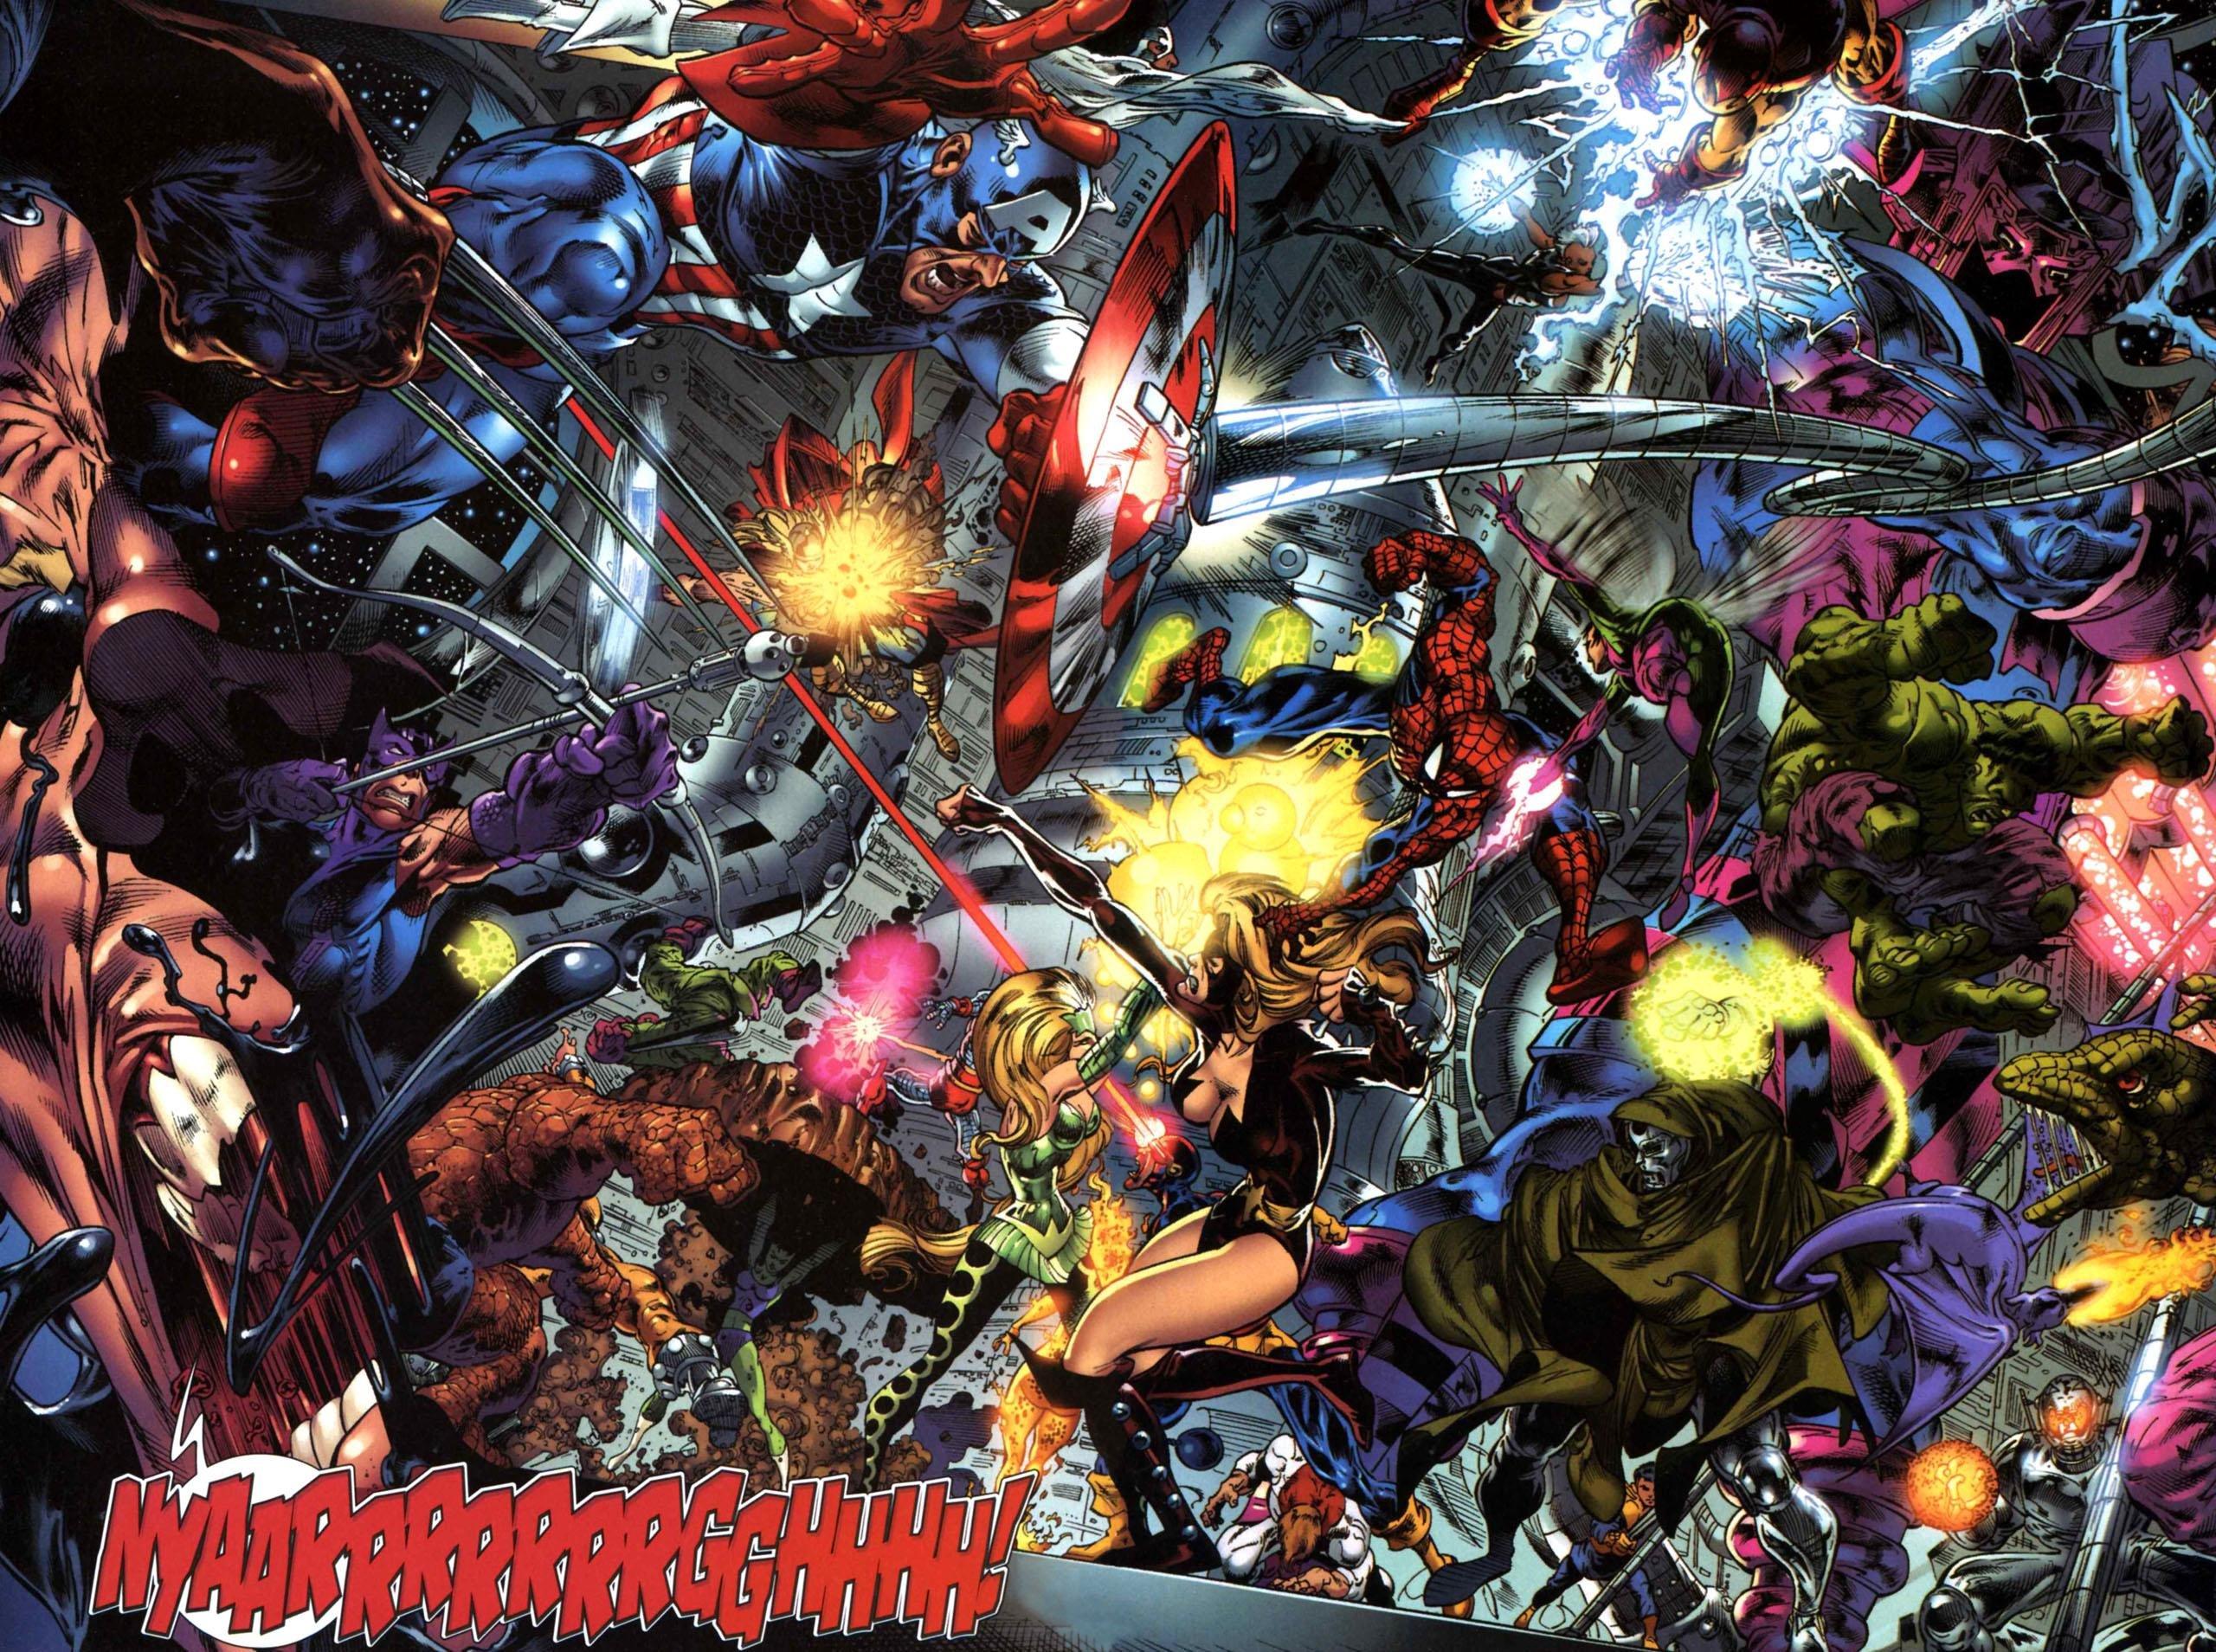 Download Wallpaper Marvel Secret Wars - 6674ccff8437937c1bd2736b9a9a0409  Pictures_274156.jpg